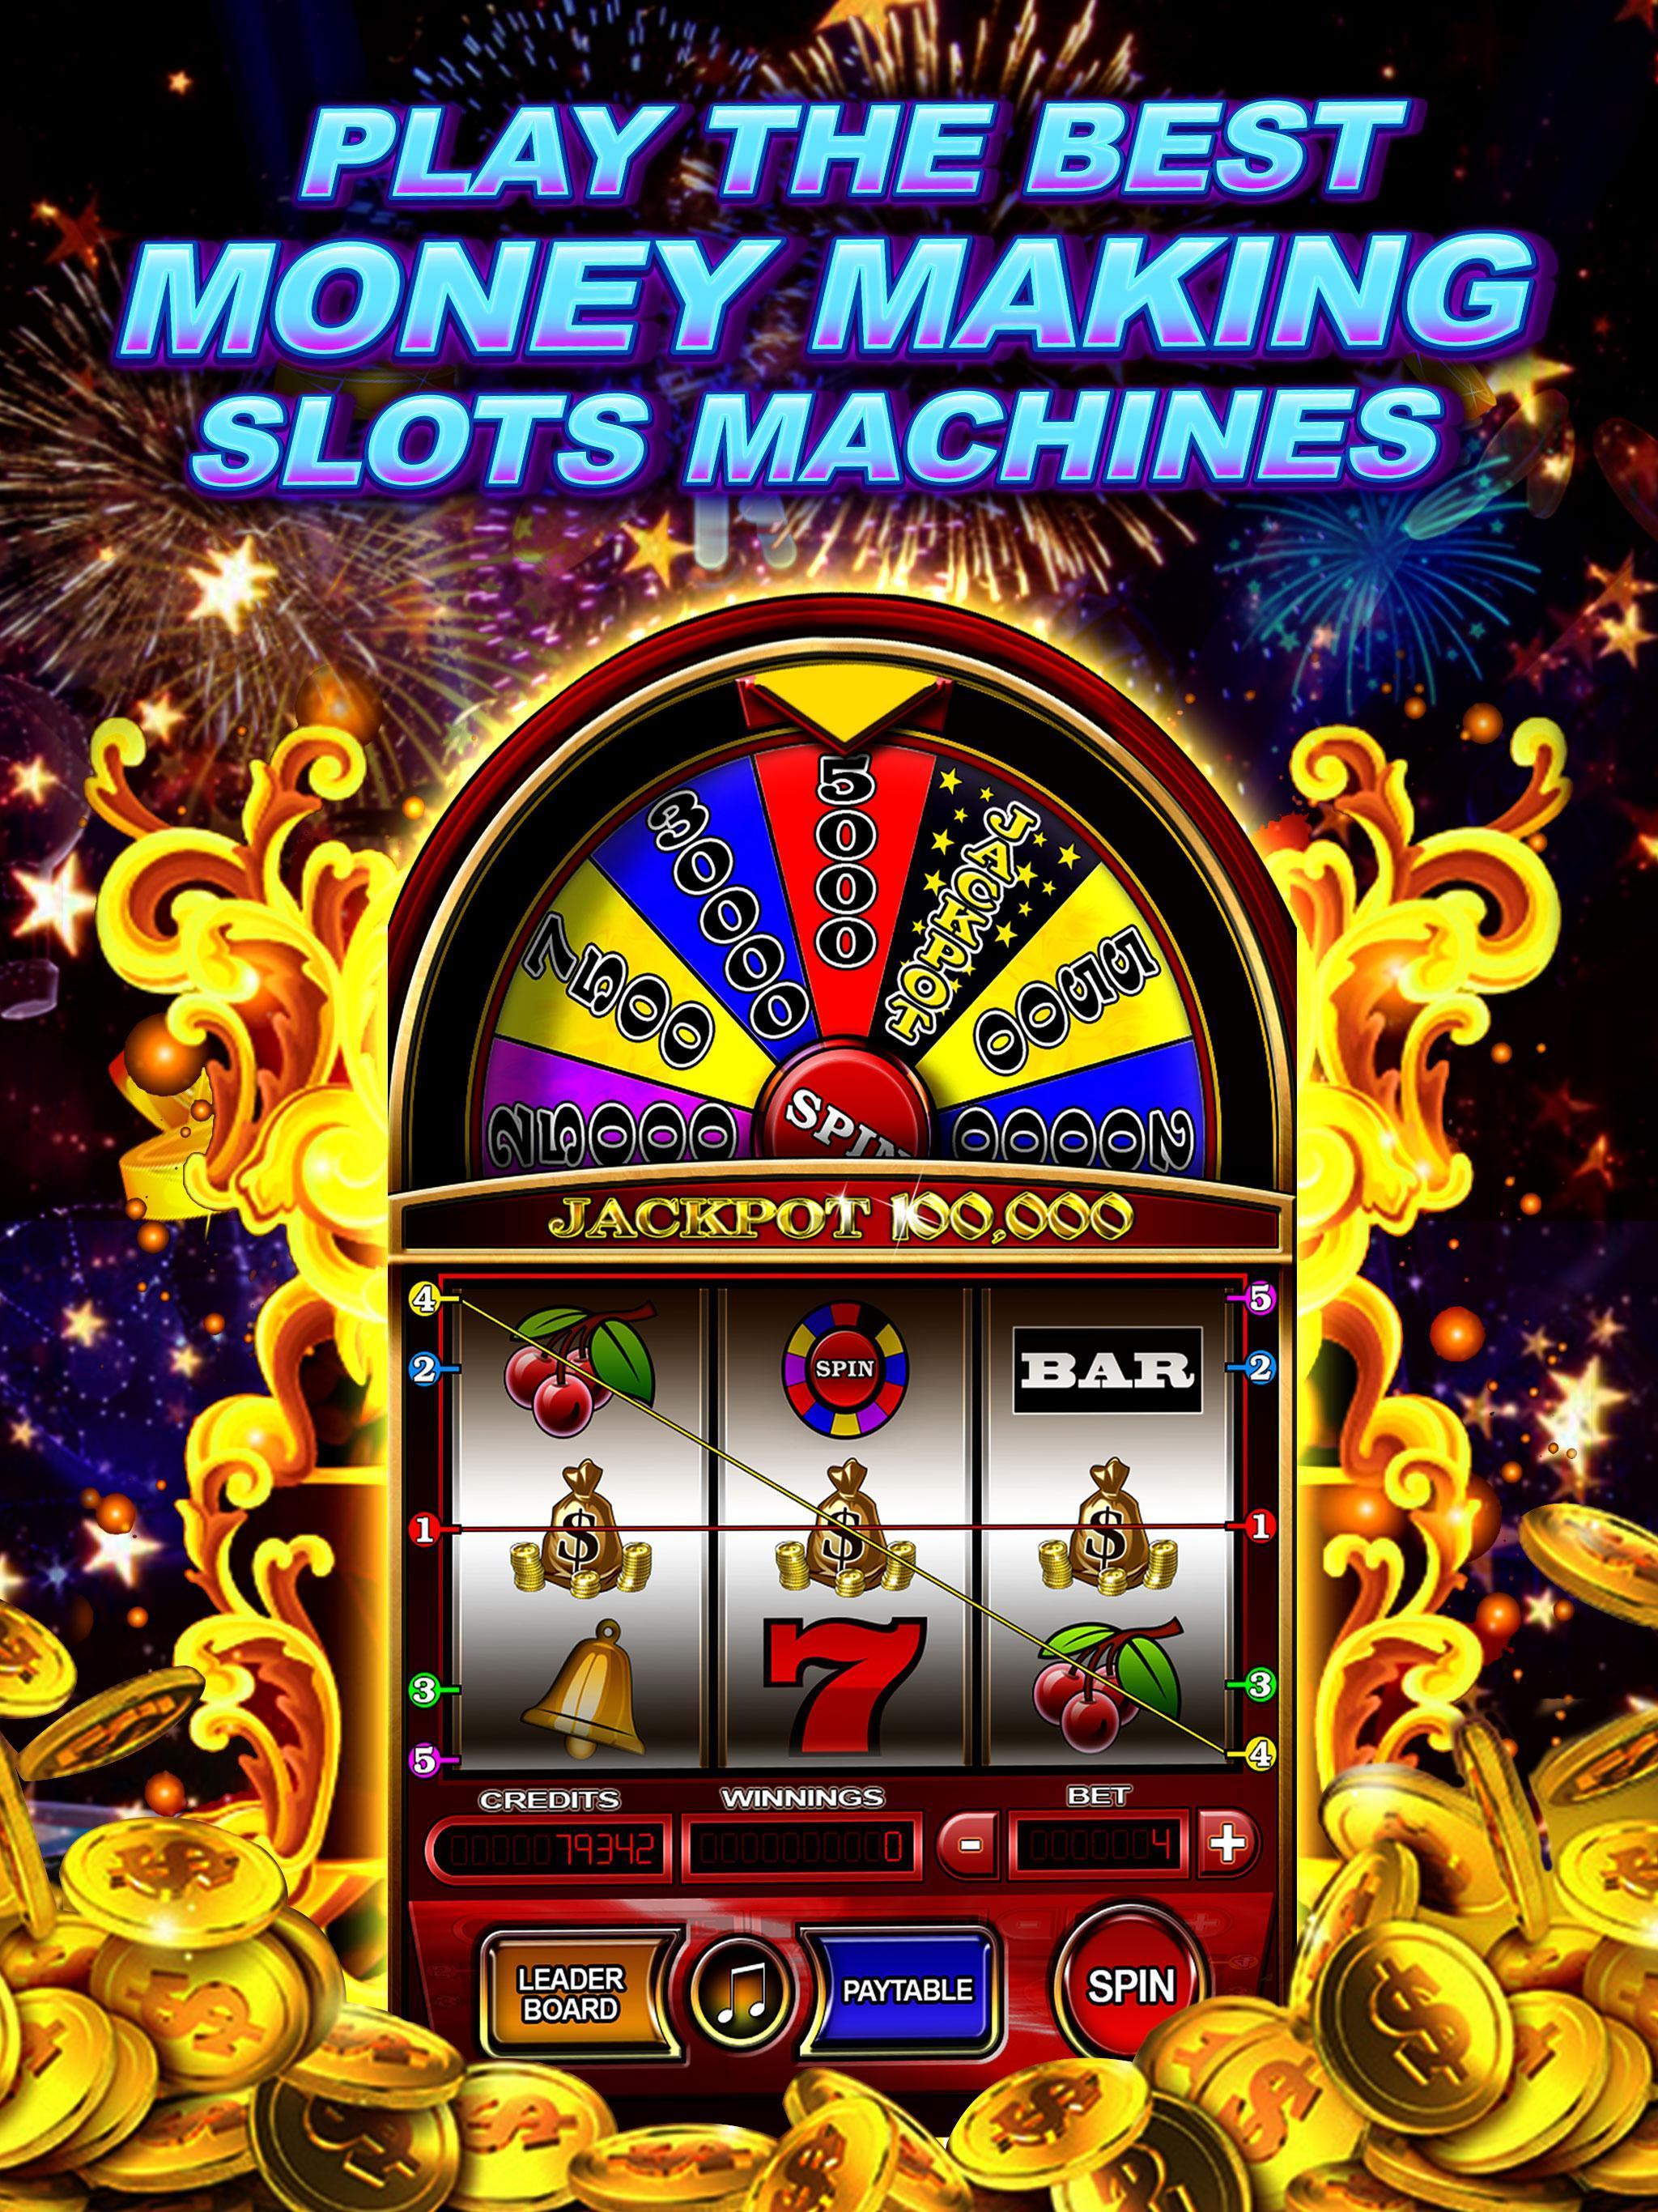 Cash Wheel Slot Machine For Sale